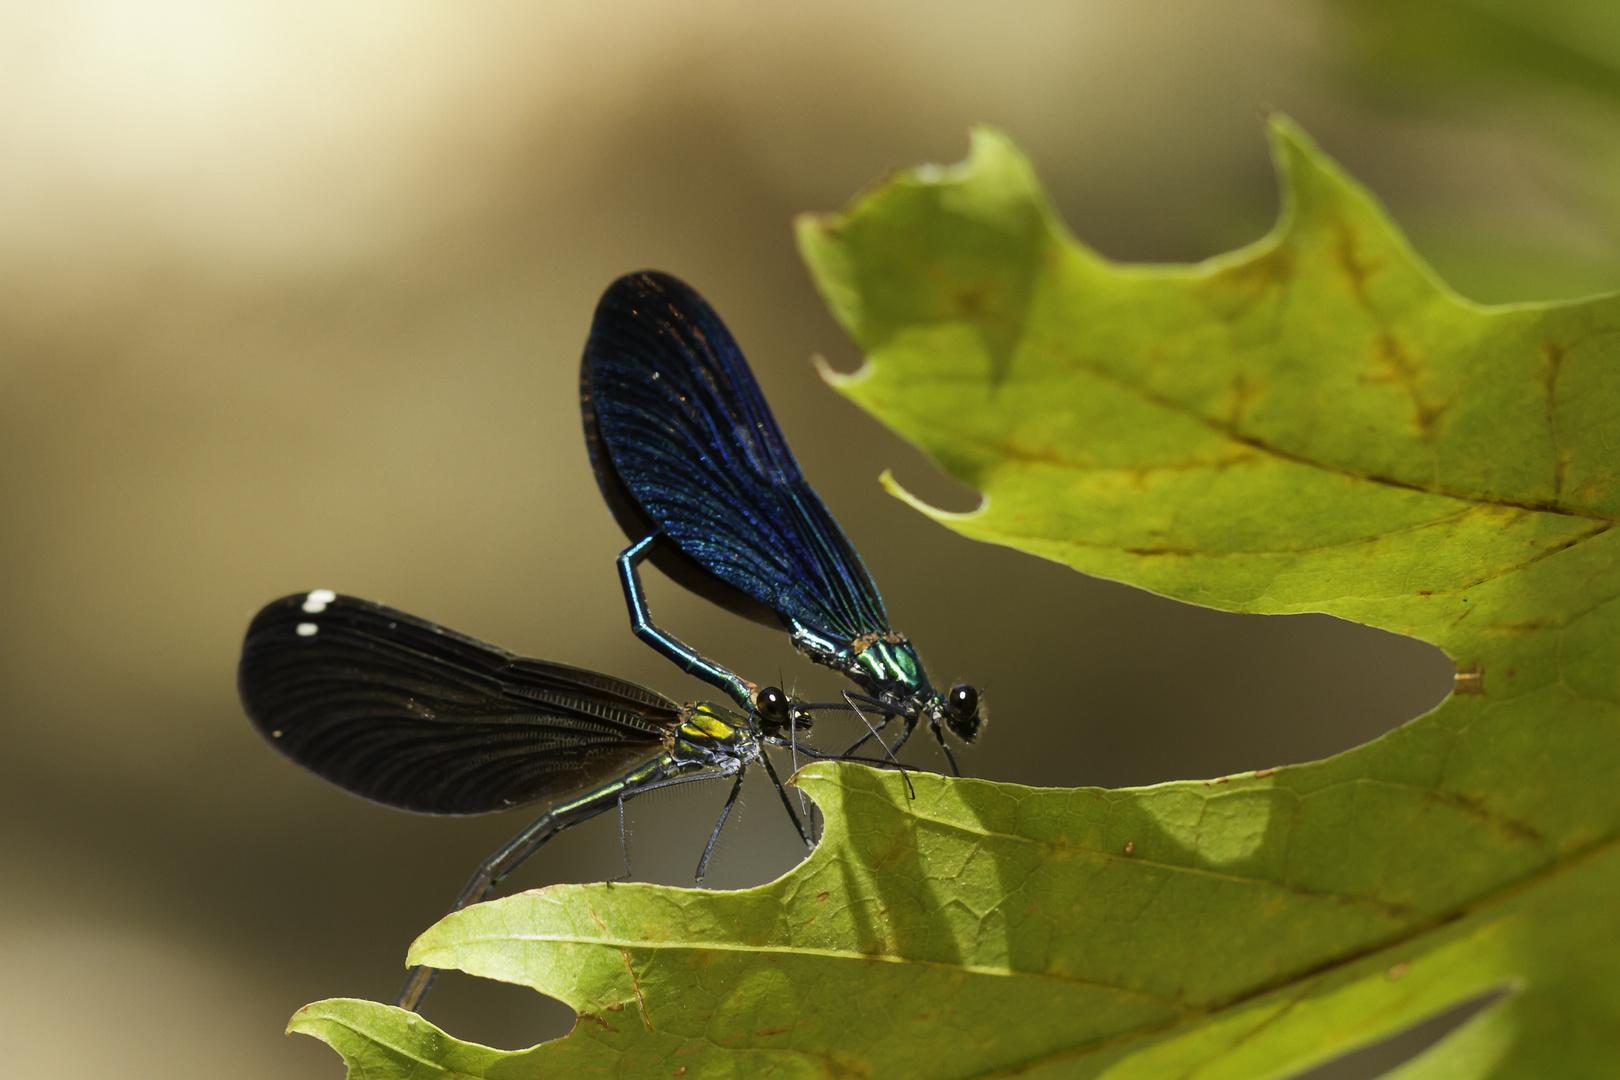 Calopteryx-Paarungsrad